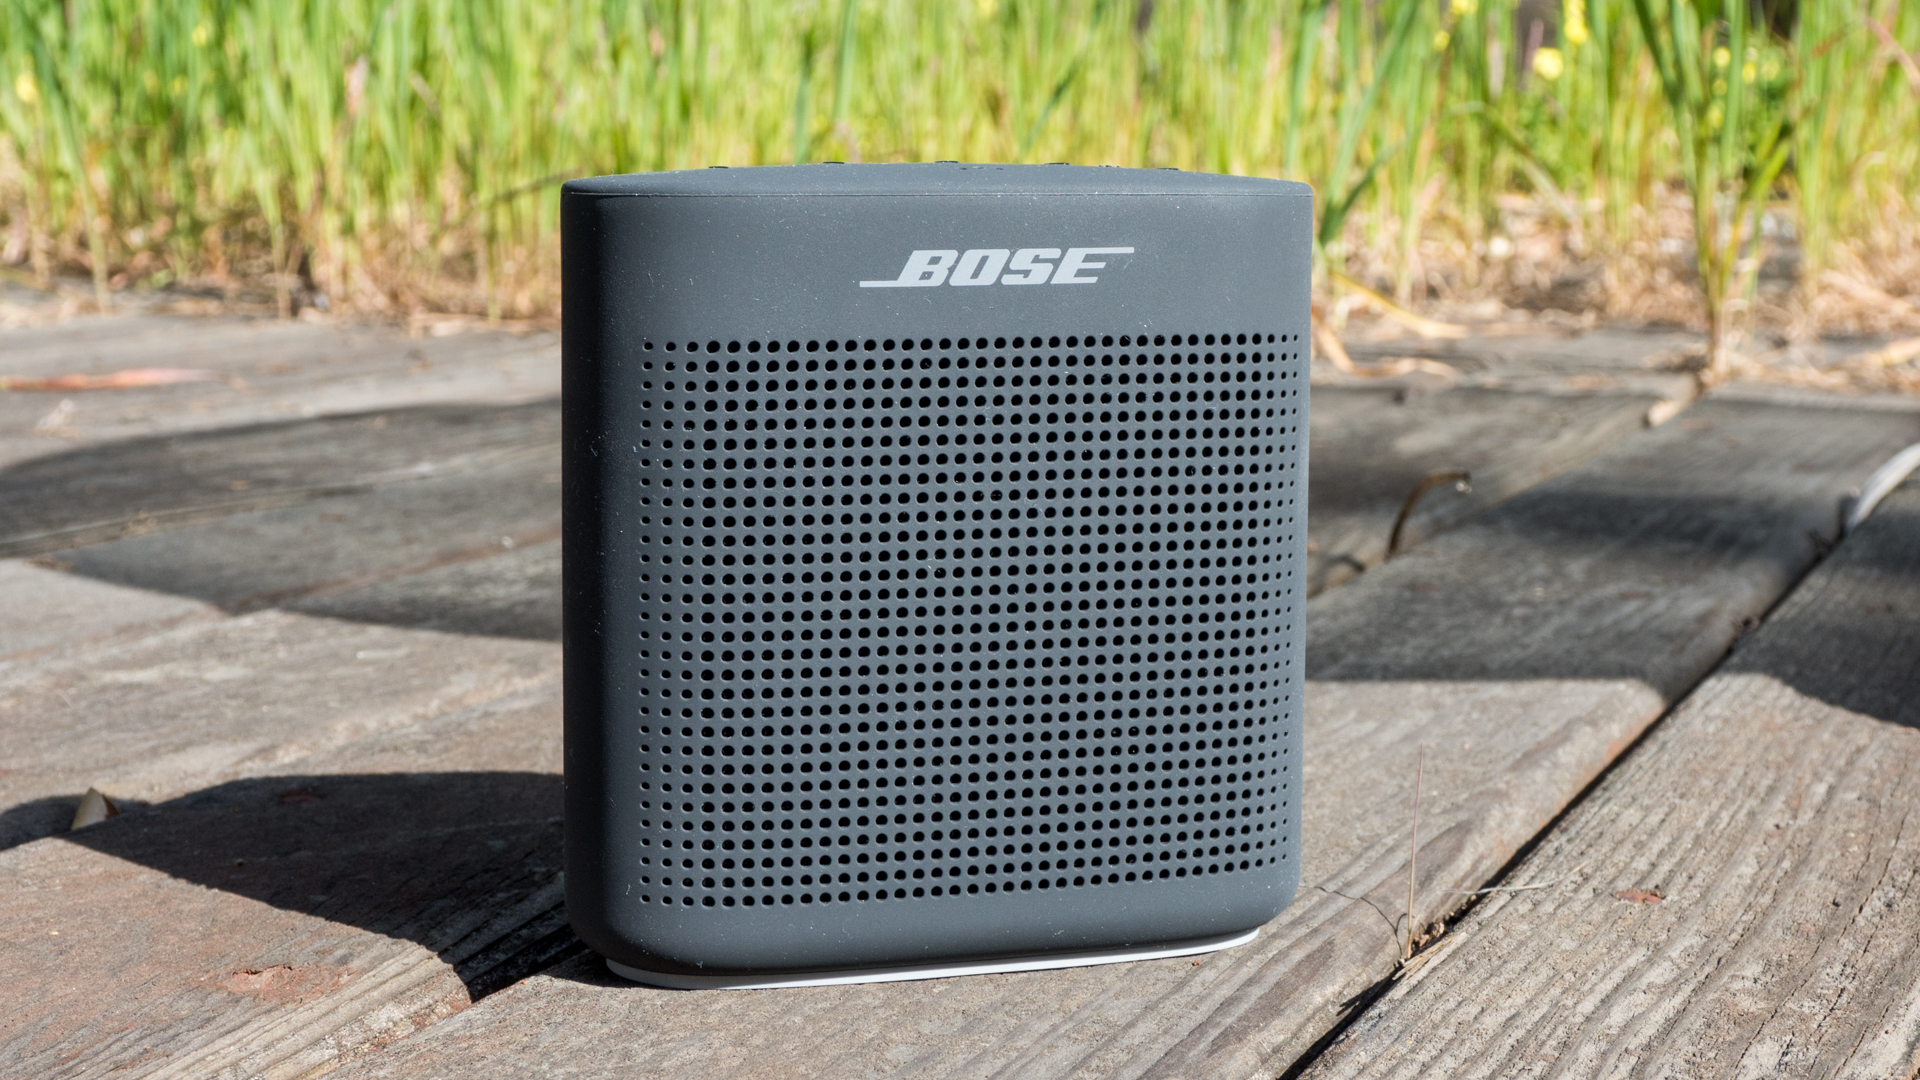 bose mini speaker review